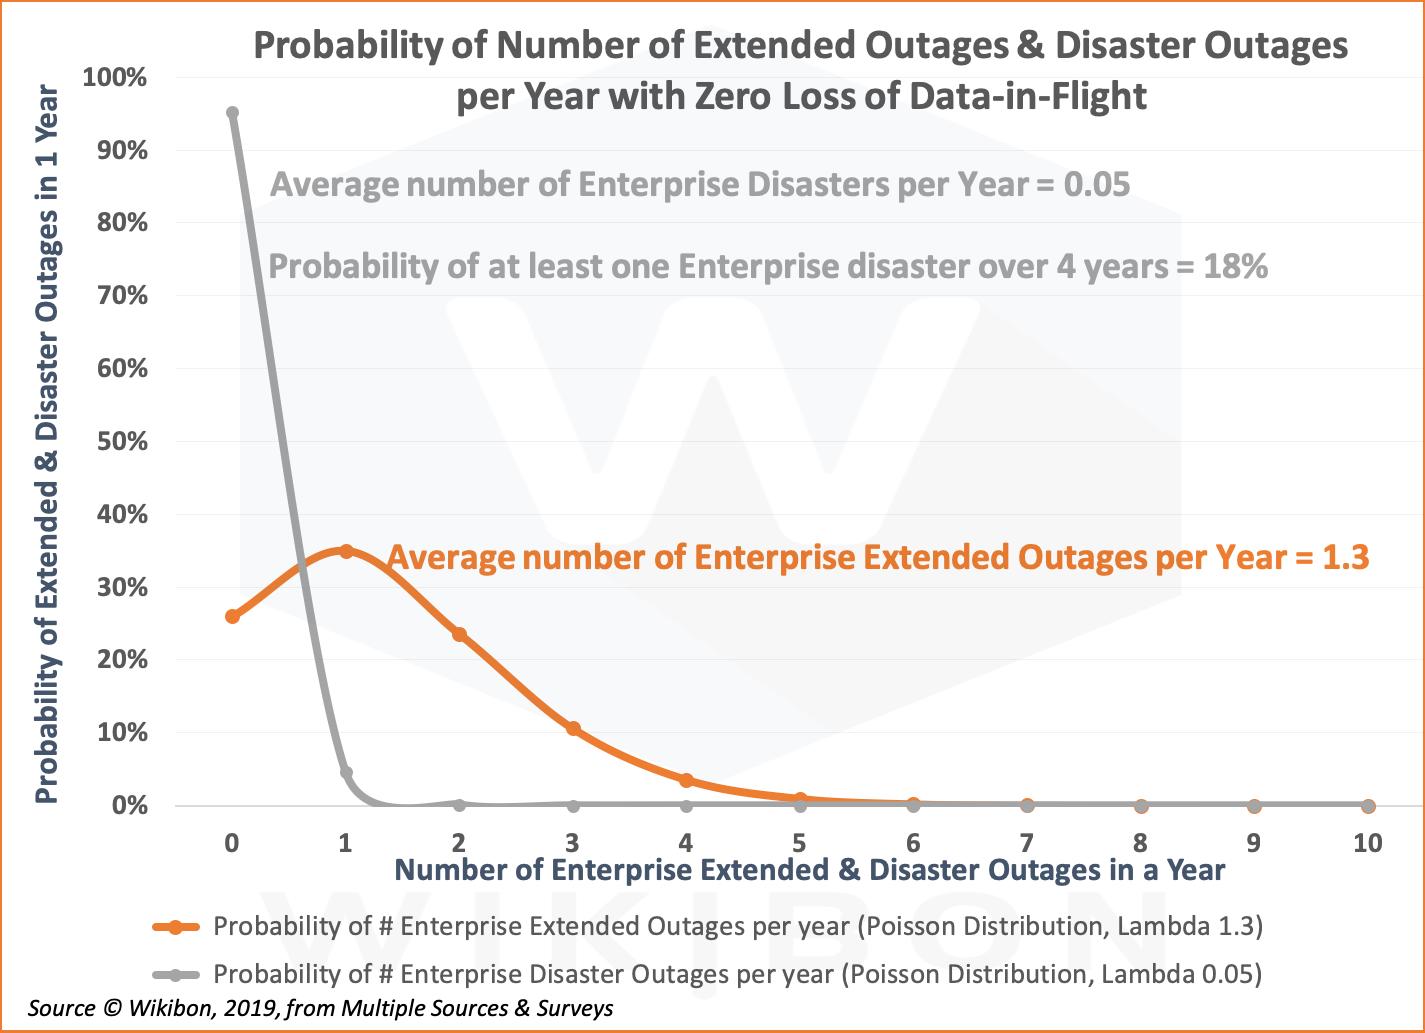 Poisson Distribution of Zero Loss of Data-in-Flight